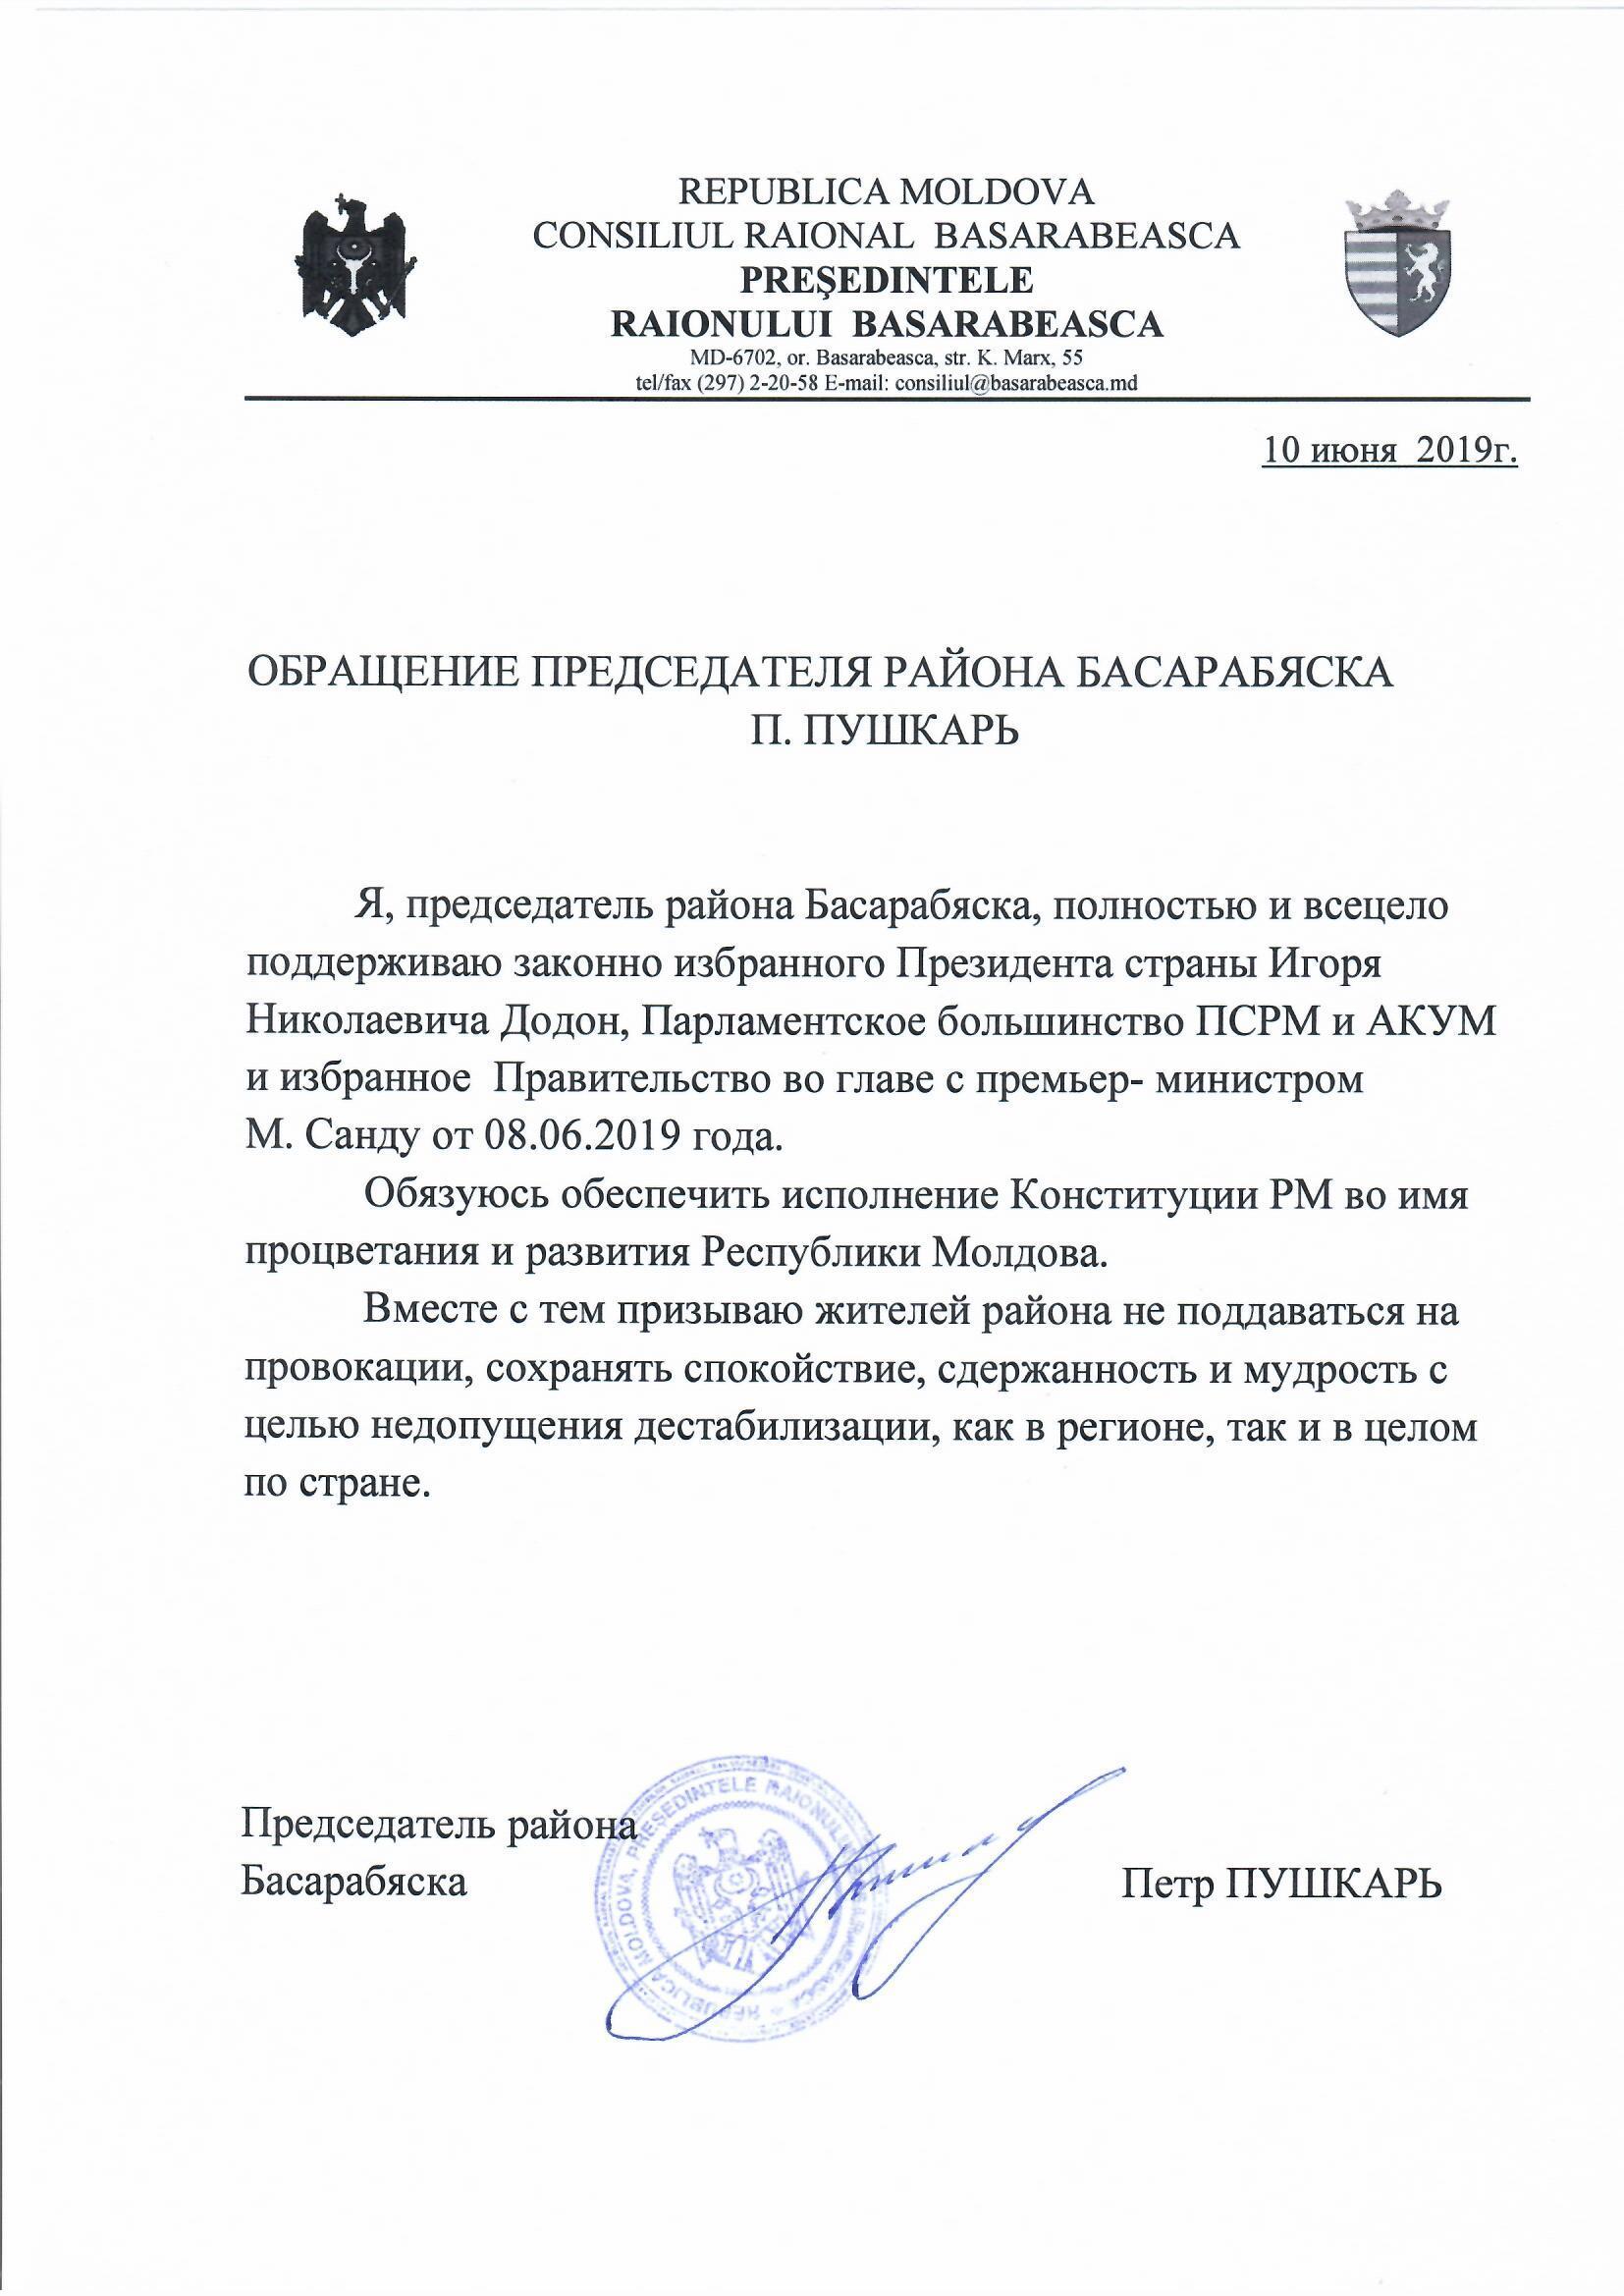 Обращение председателя района Петра Пушкарь